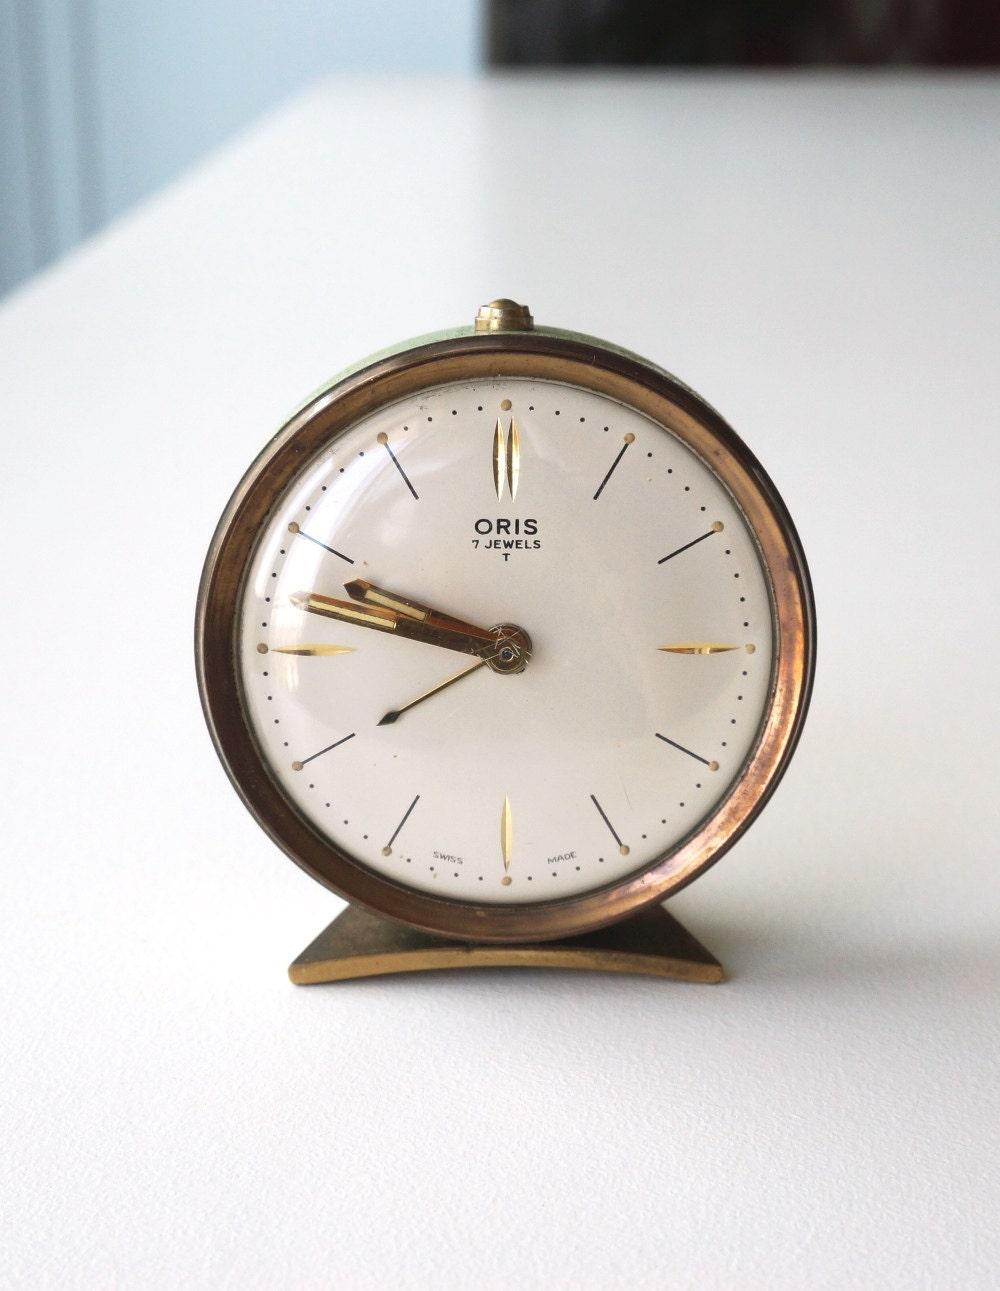 Small Alarm Clock 1950s vintage ORIS clock Swiss made pale